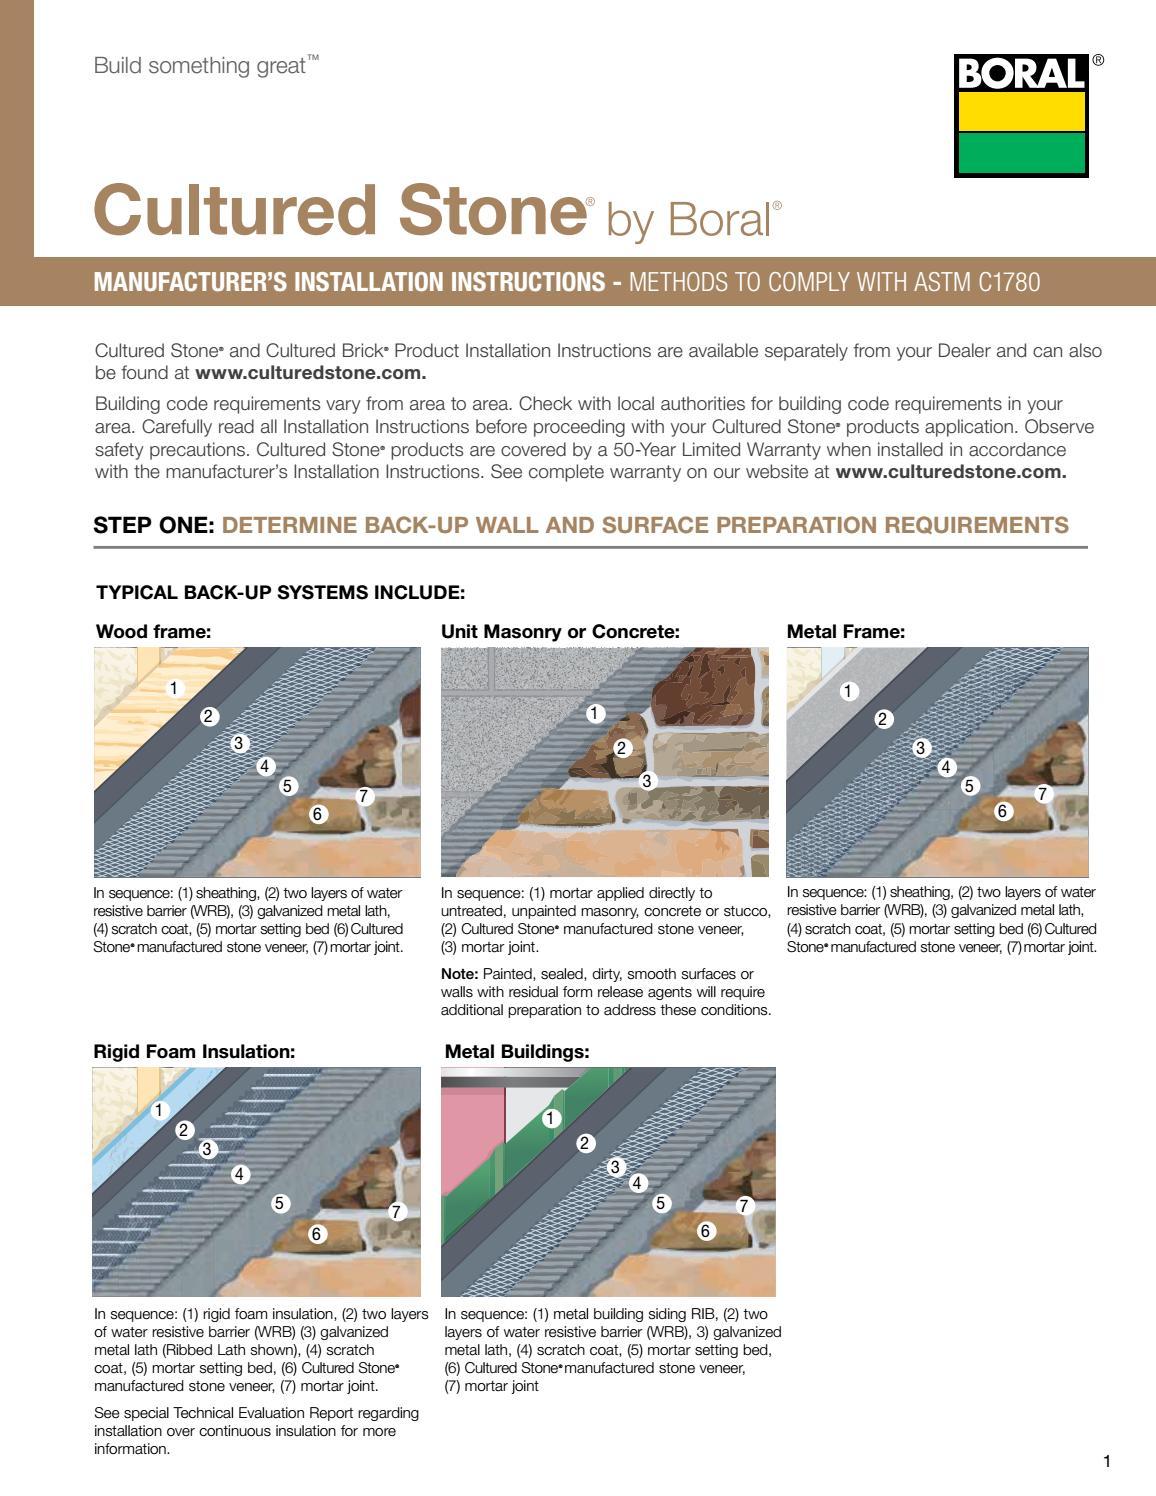 BORAL Cultured Stone - Installation guide by Mega Centre Montreal